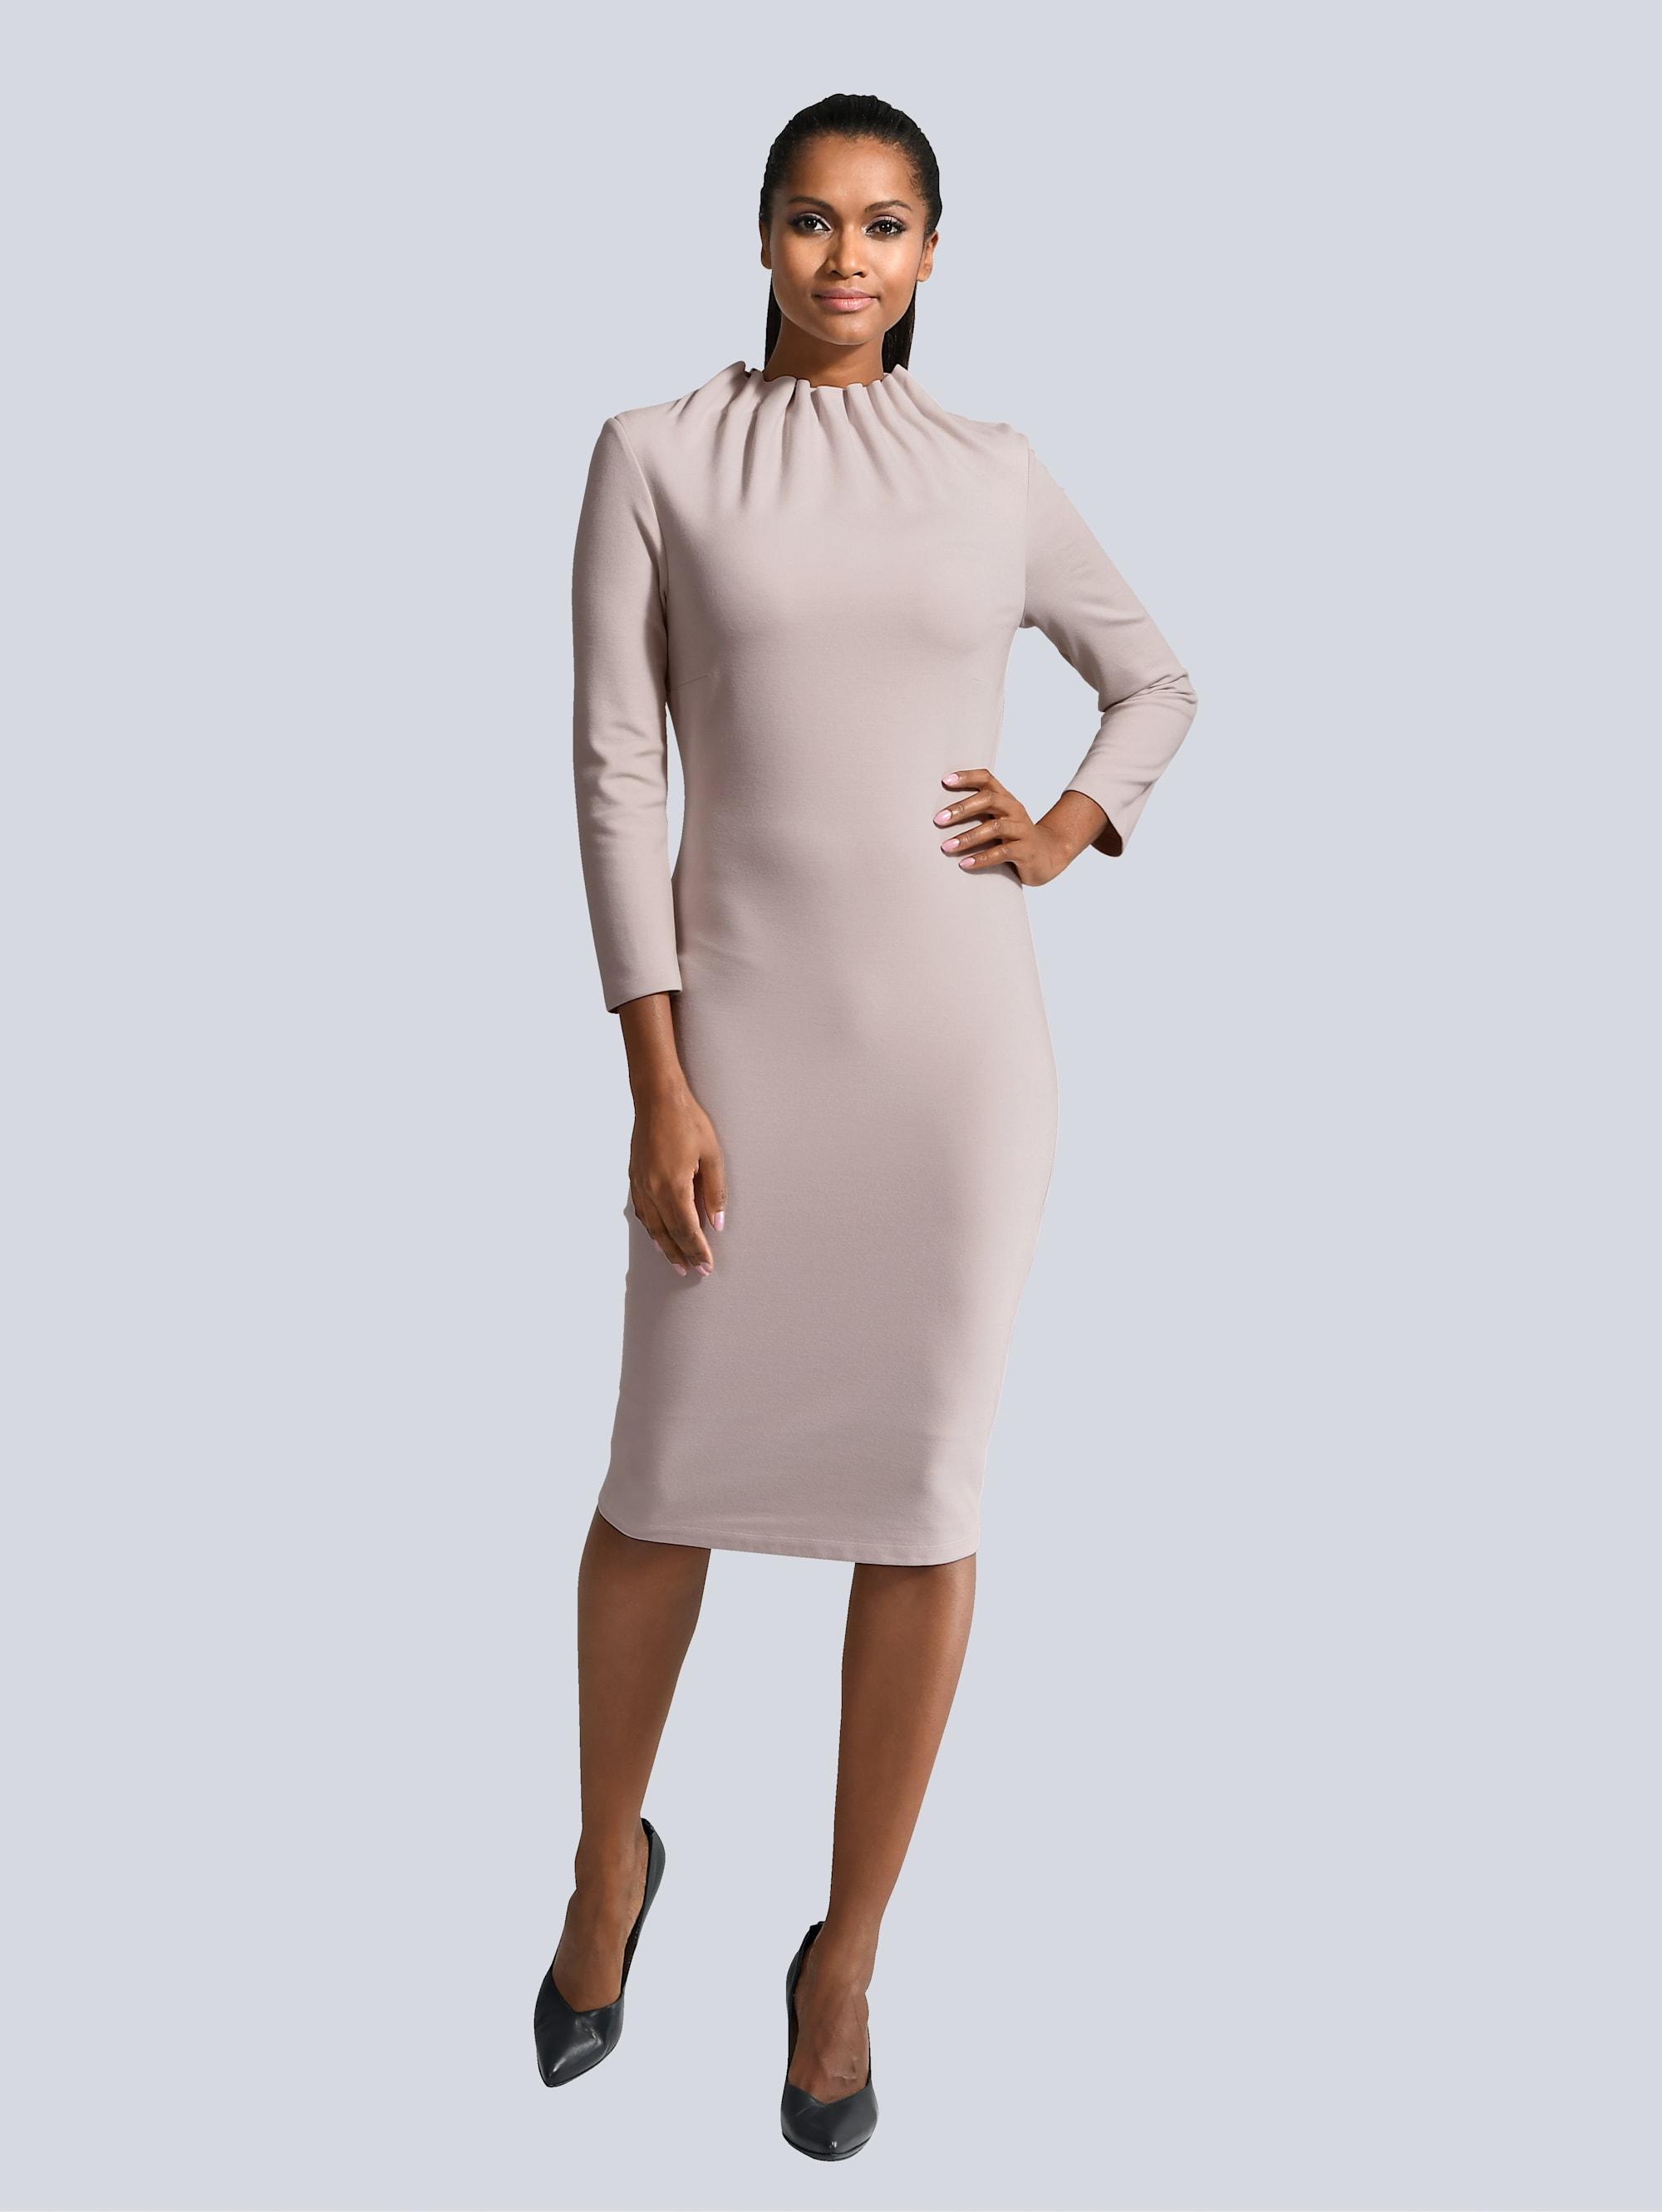 Alba Moda Kleid mit gerafftem Stehkragen ADOwZ KBev7